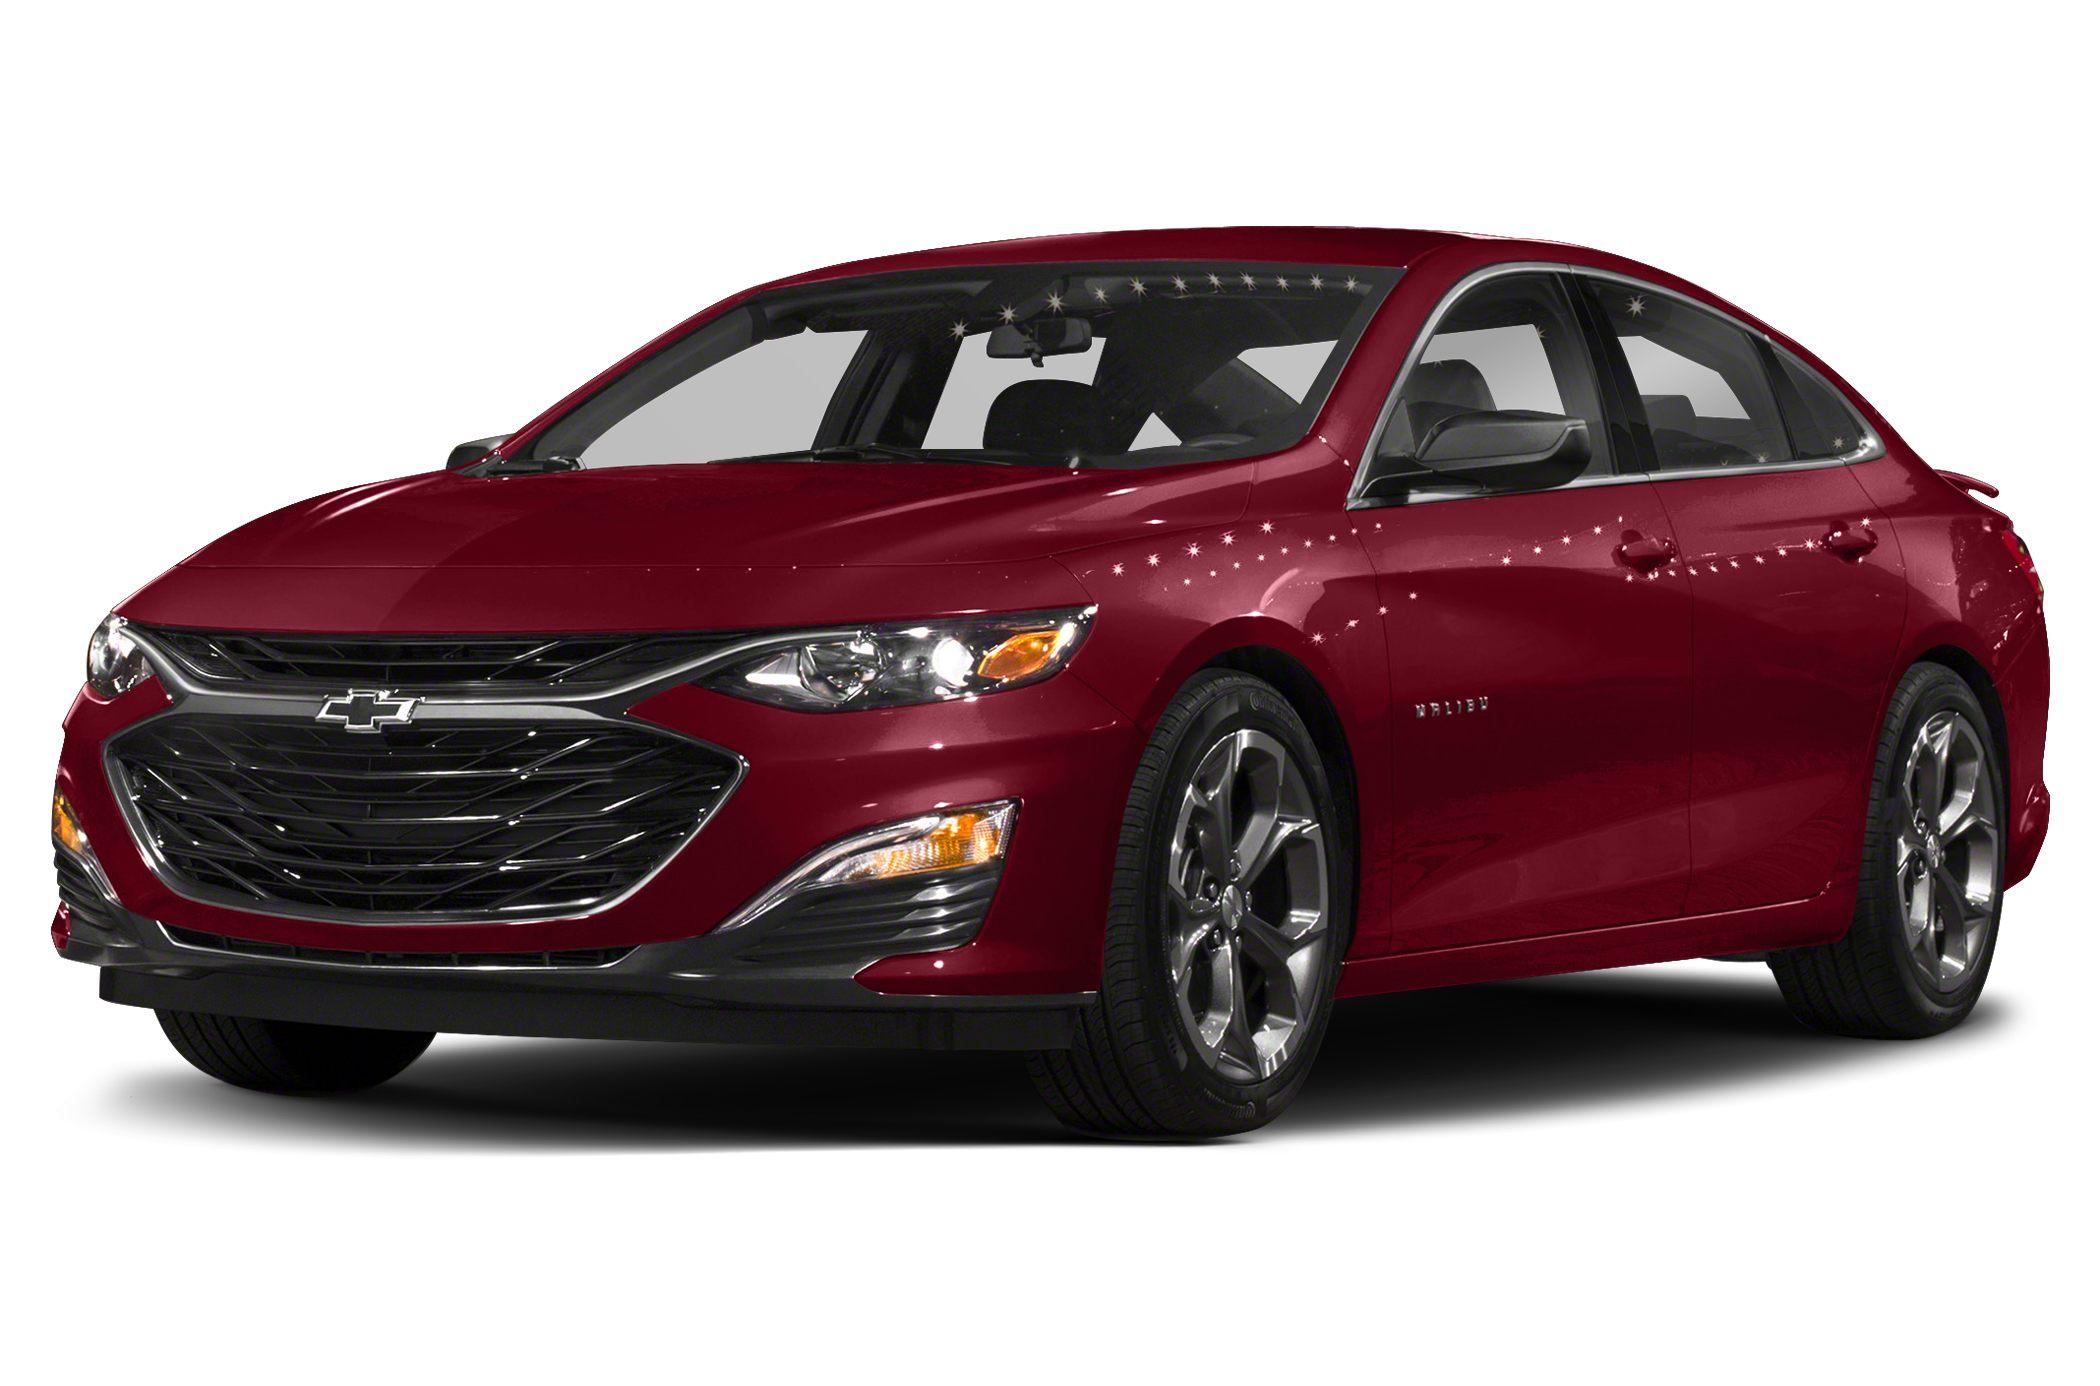 2019 Chevrolet Malibu Premier 4dr Sedan Pricing and Options